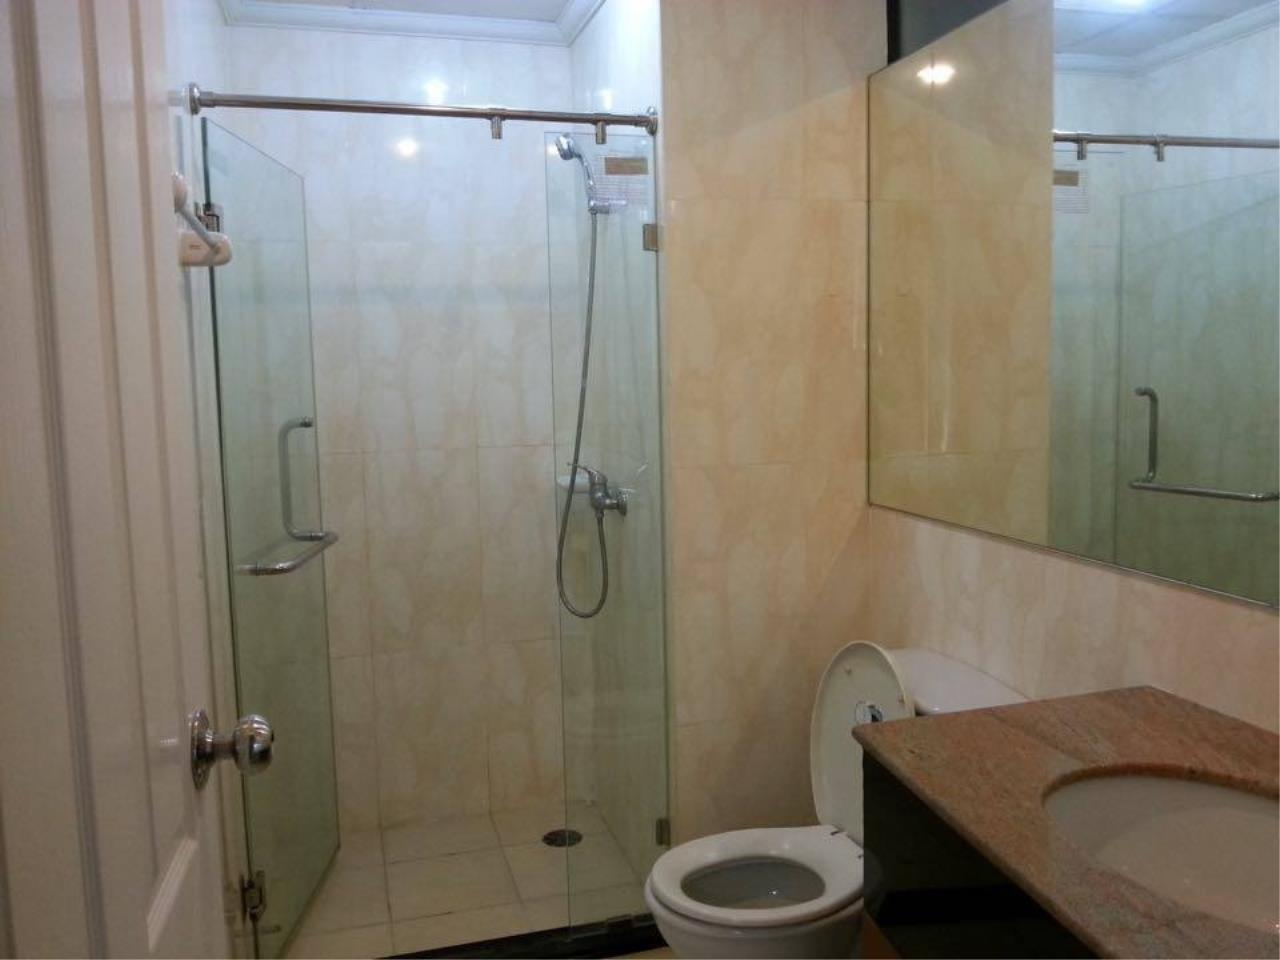 Agent - Mayteekul Sujirapinyokul Agency's AC3180418 For Rent Condo Supalai Premier Place Asoke Condo MRT Phetchaburi 3